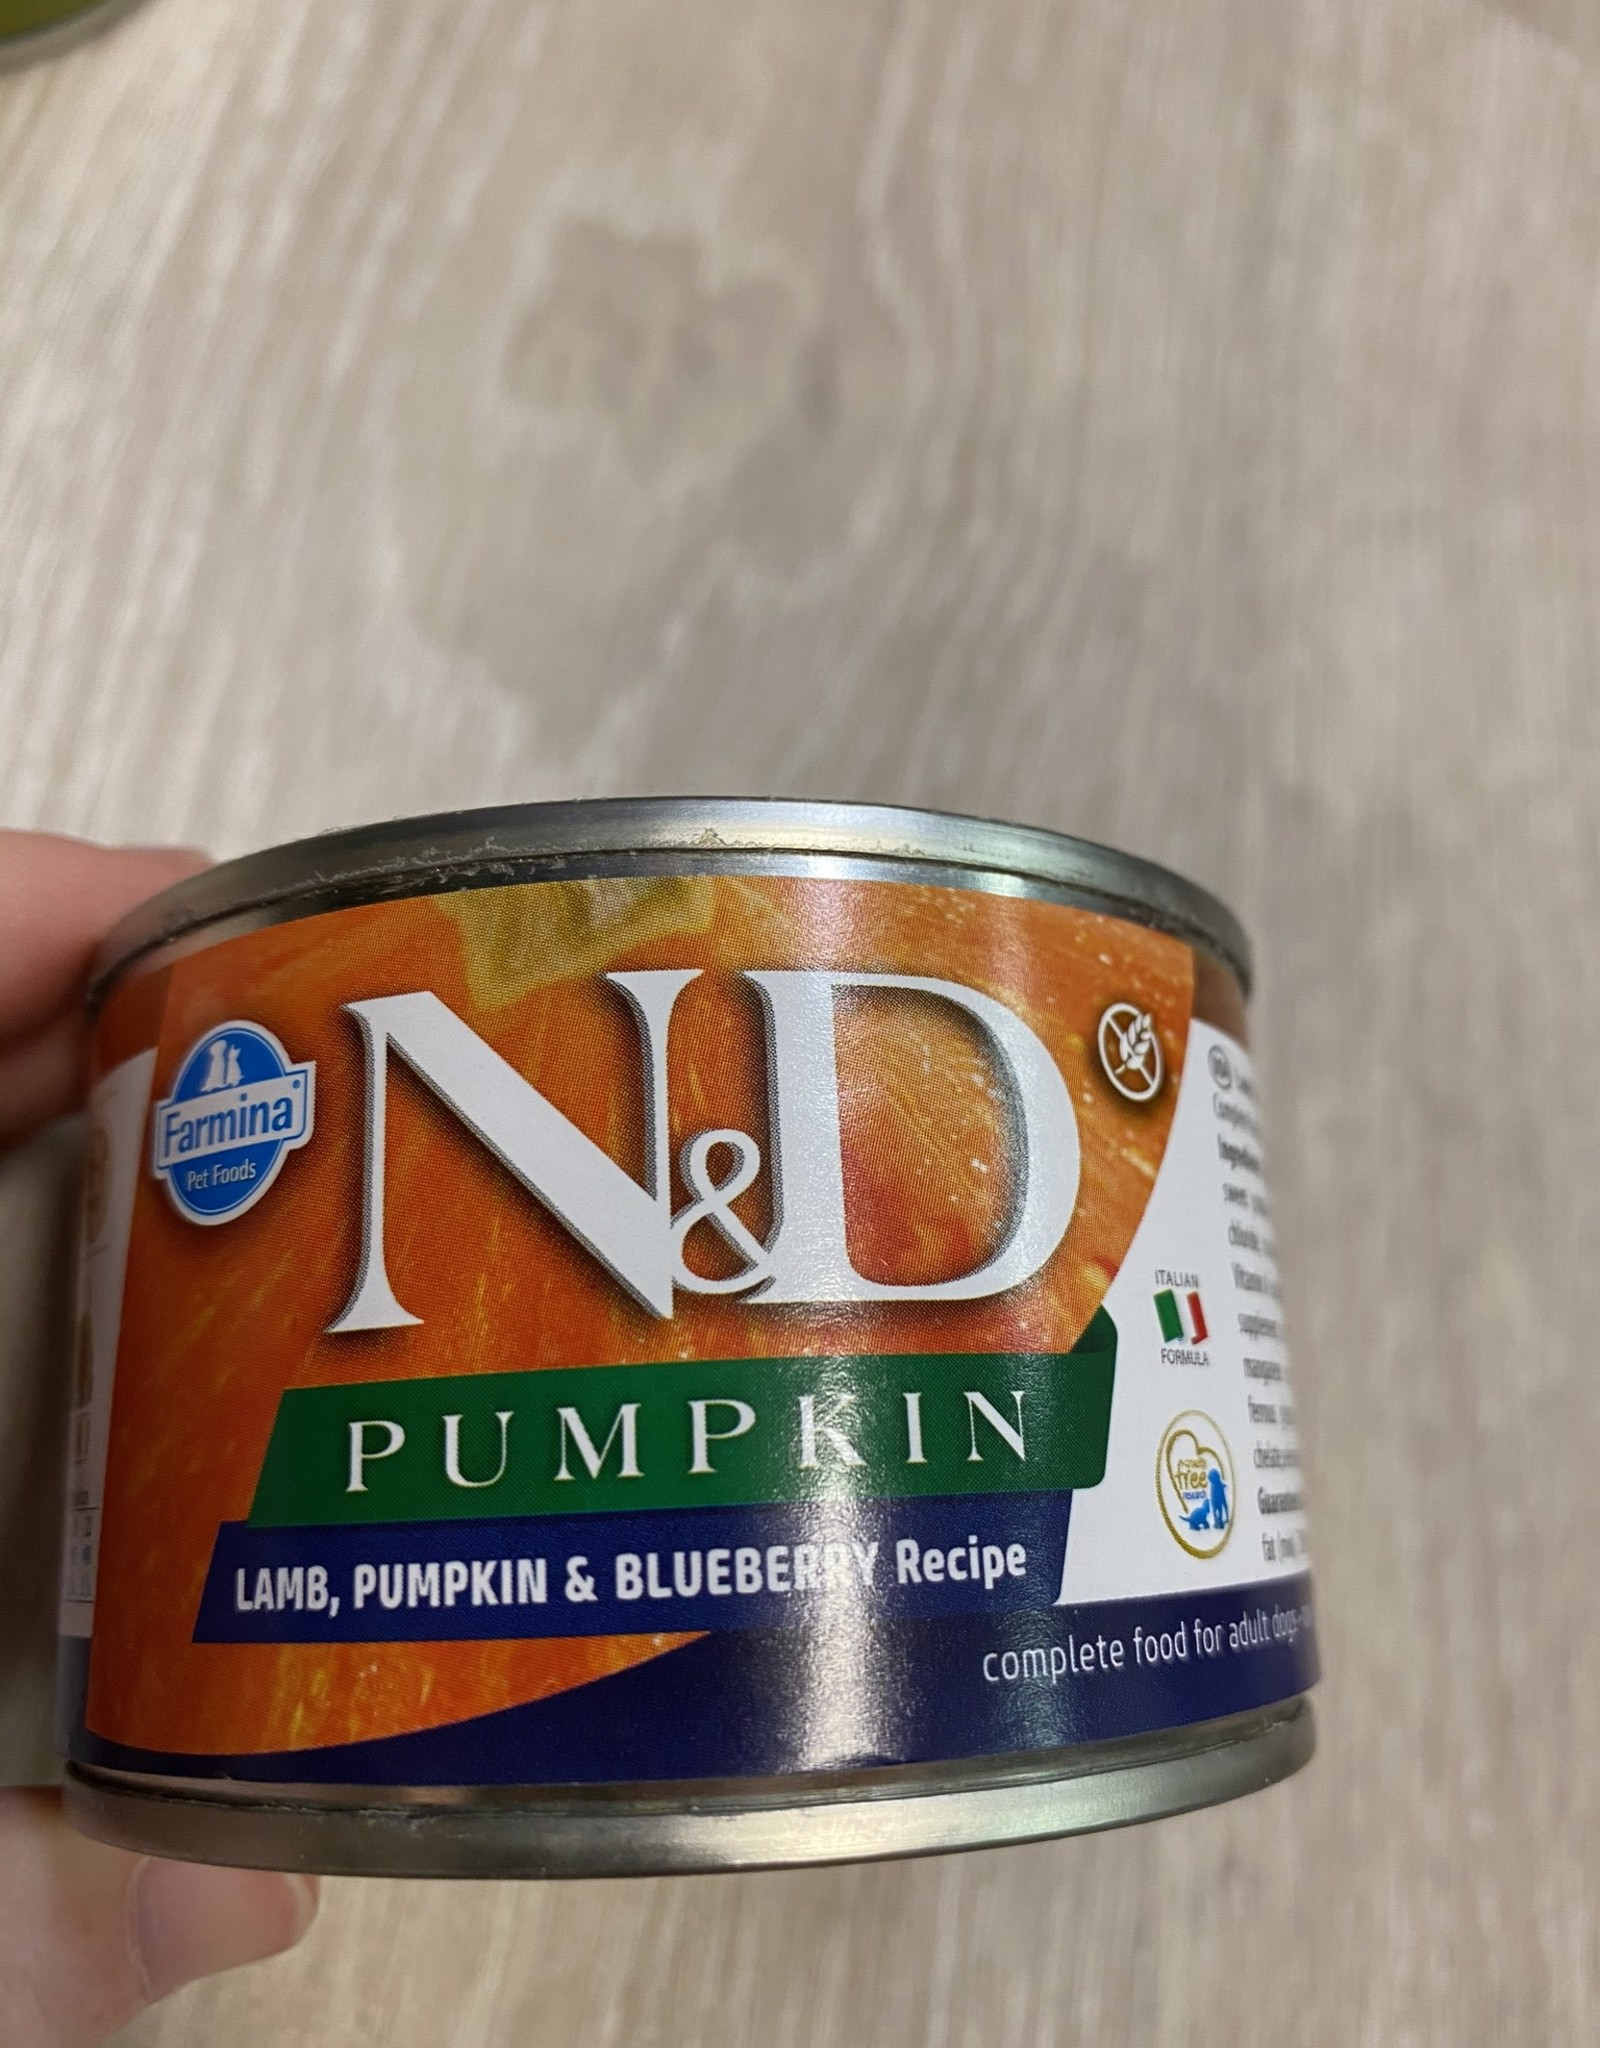 Farmina N&D Pumpkin-  Lamb, Pumpkin, & Blueberry 4.9oz Can